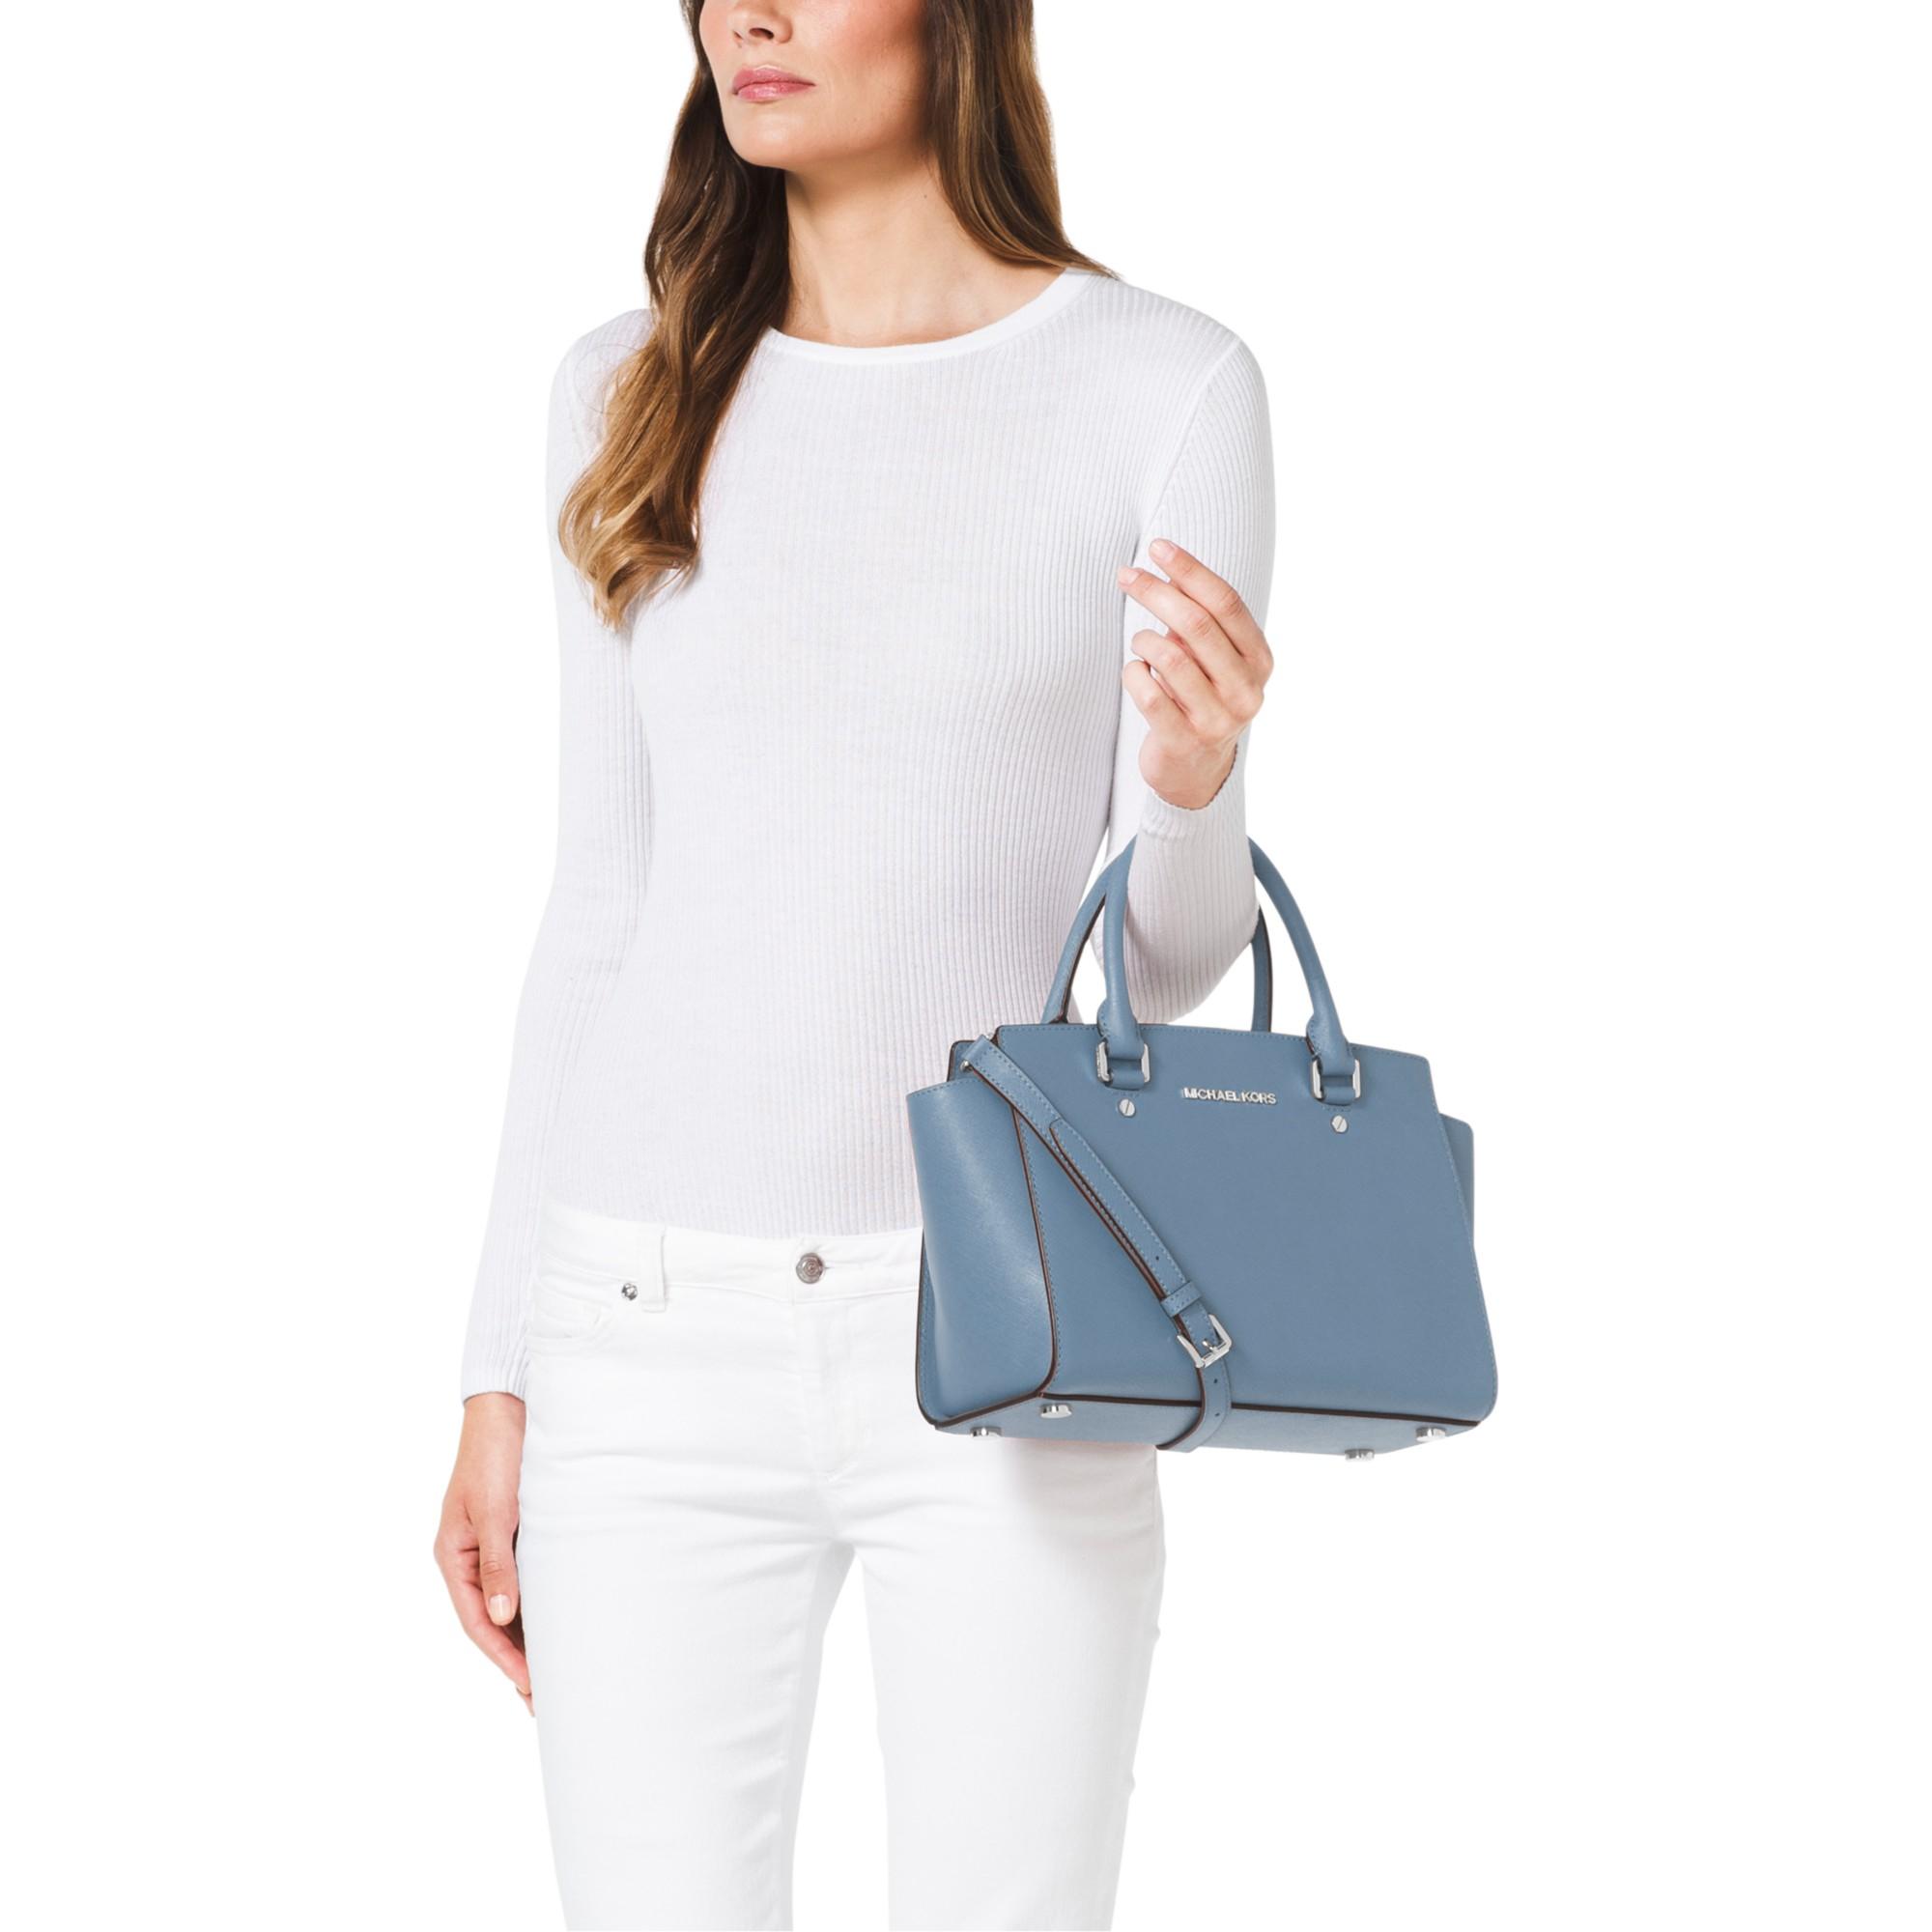 d77b133772 MICHAEL Michael Kors Selma Medium Top Zip Leather Satchel in Blue - Lyst